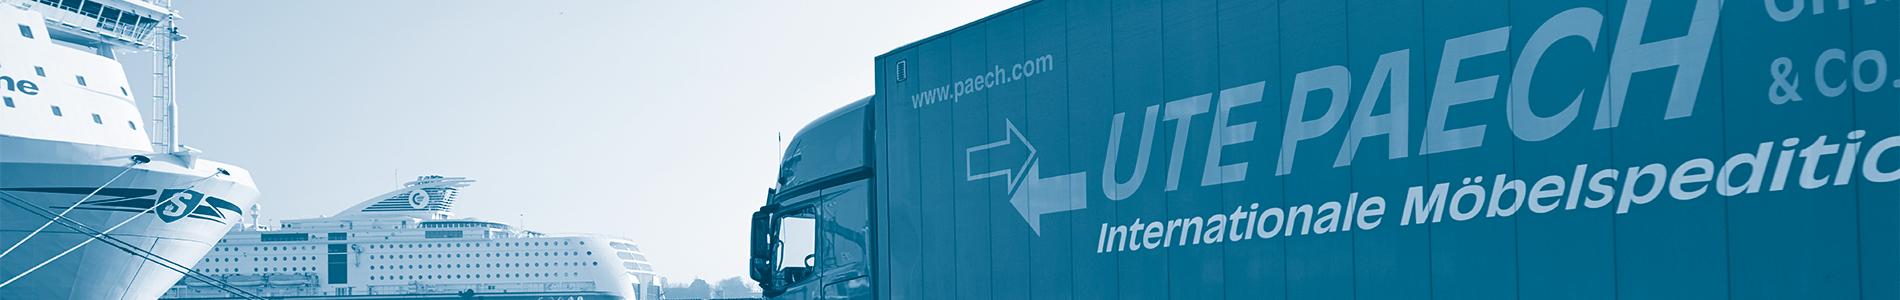 Ute Paech GmbH & Co. KG - Scandinavia Europe Worldwide